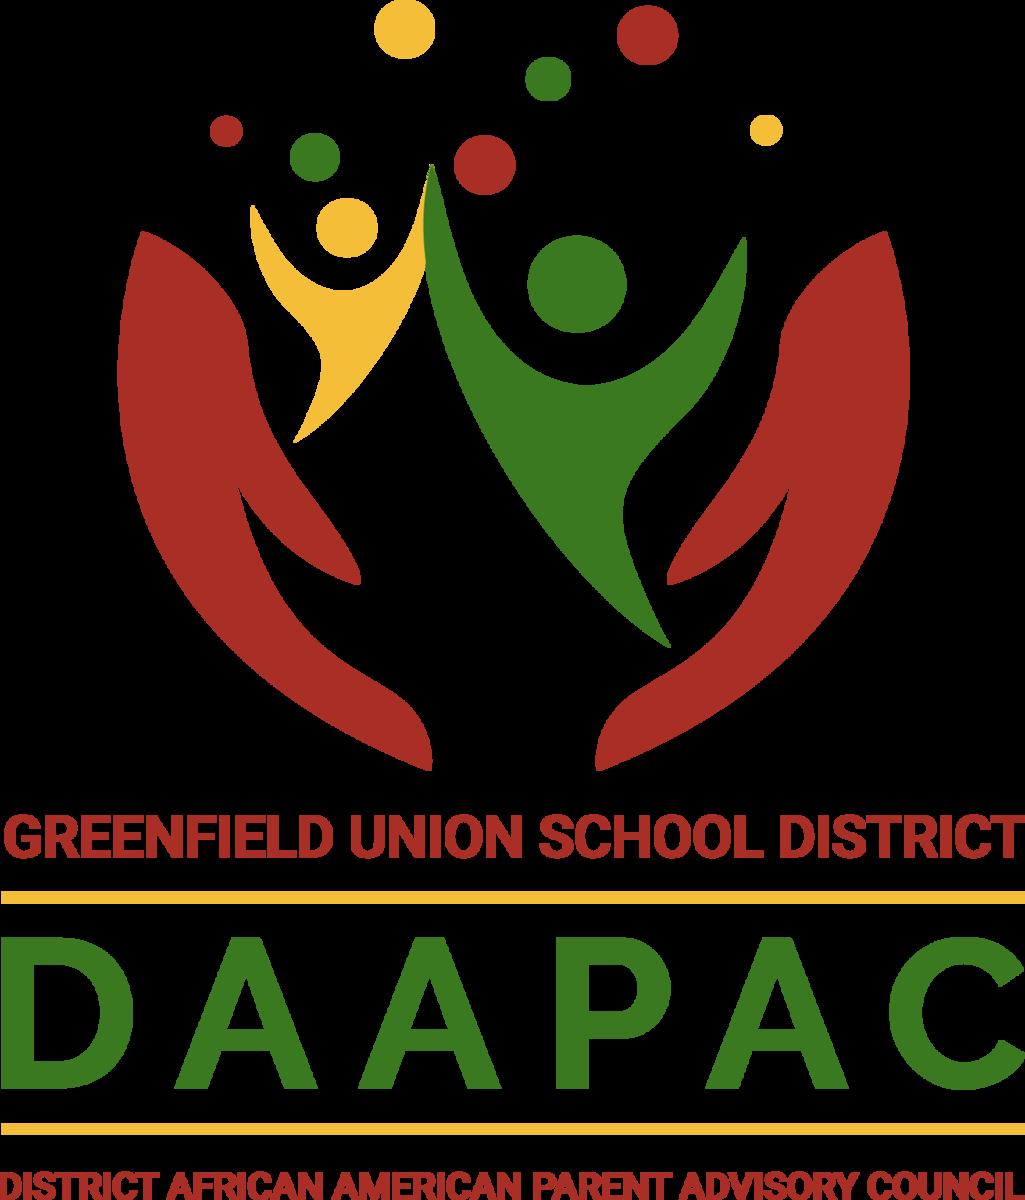 DAAPAC Logo